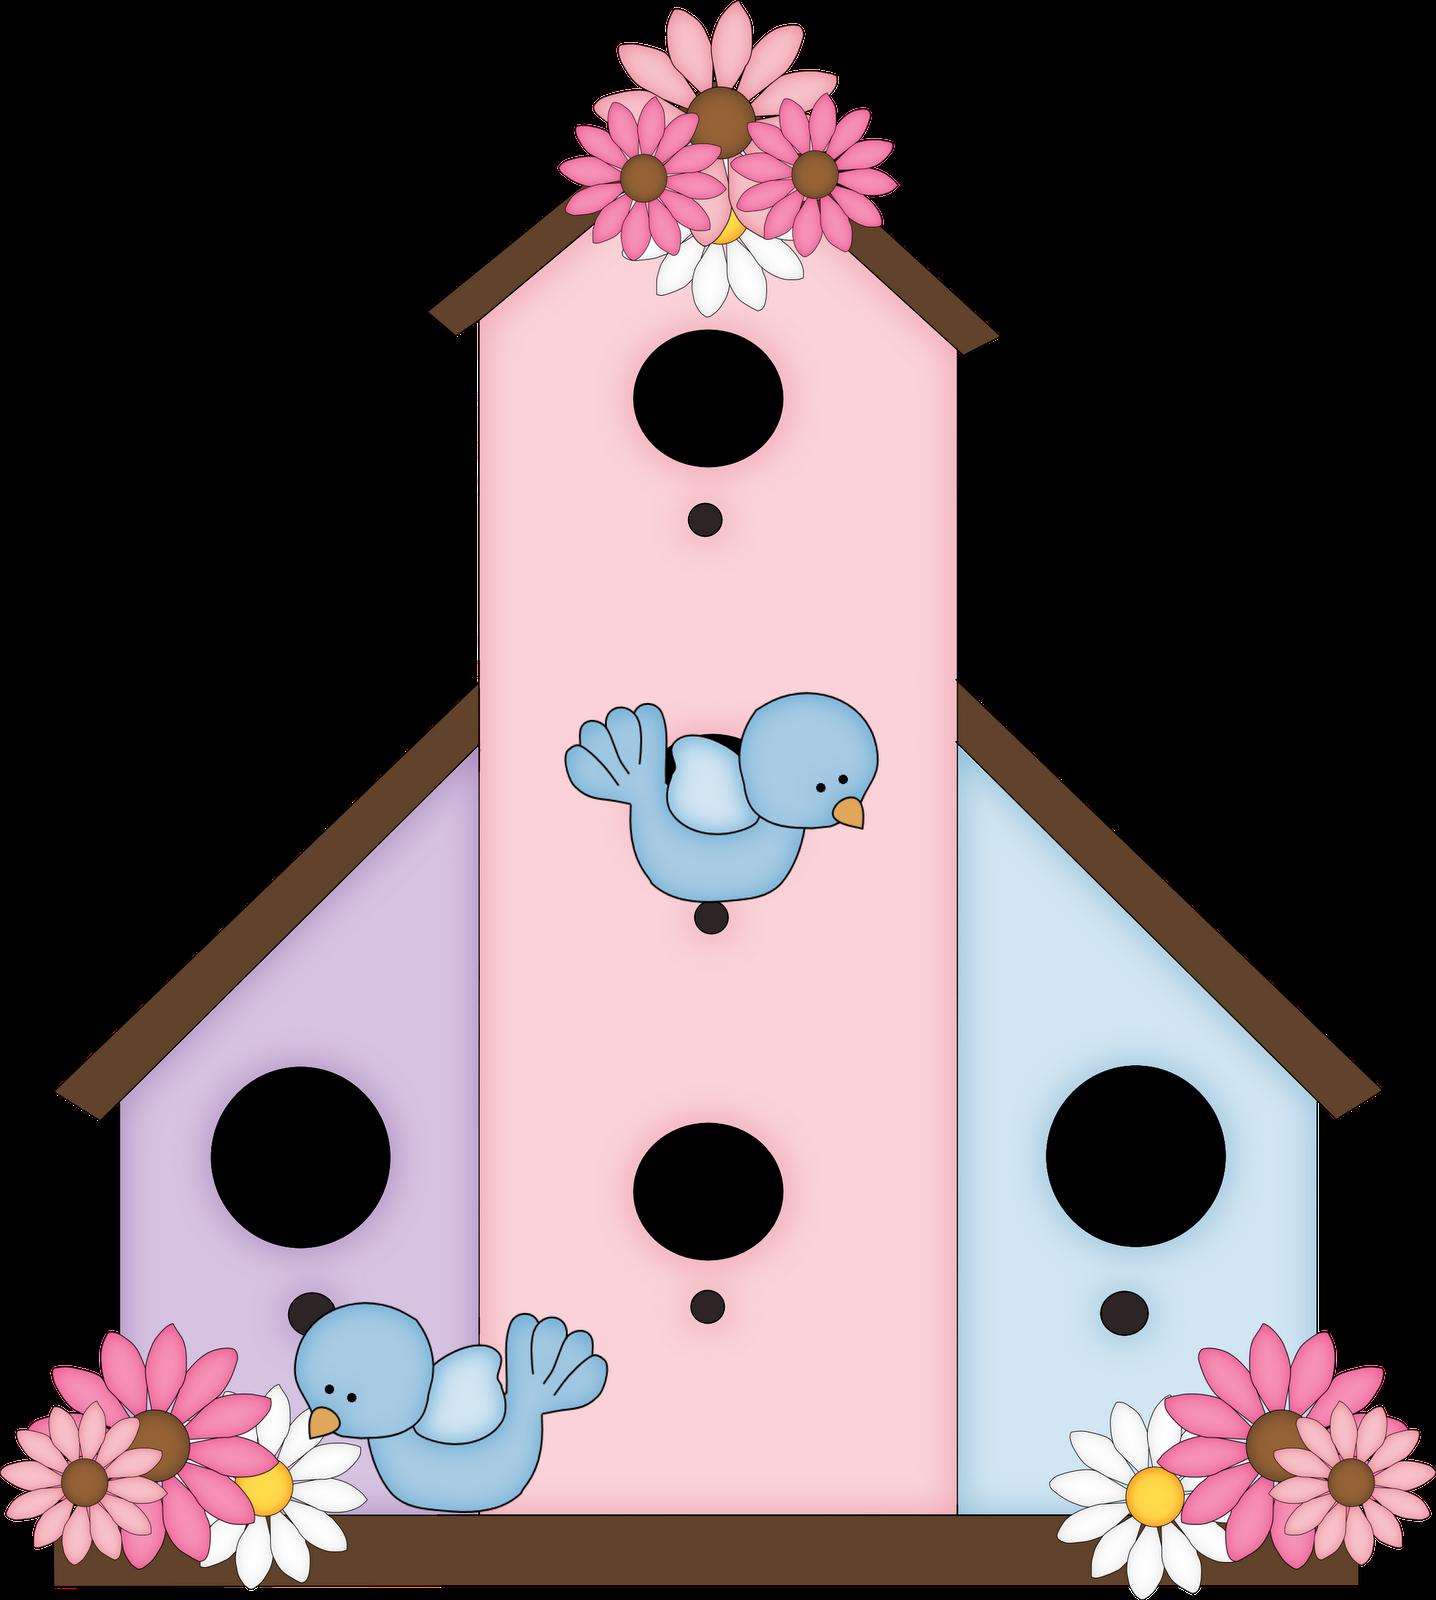 Birdhouse cliparts. Kitchen clipart cute